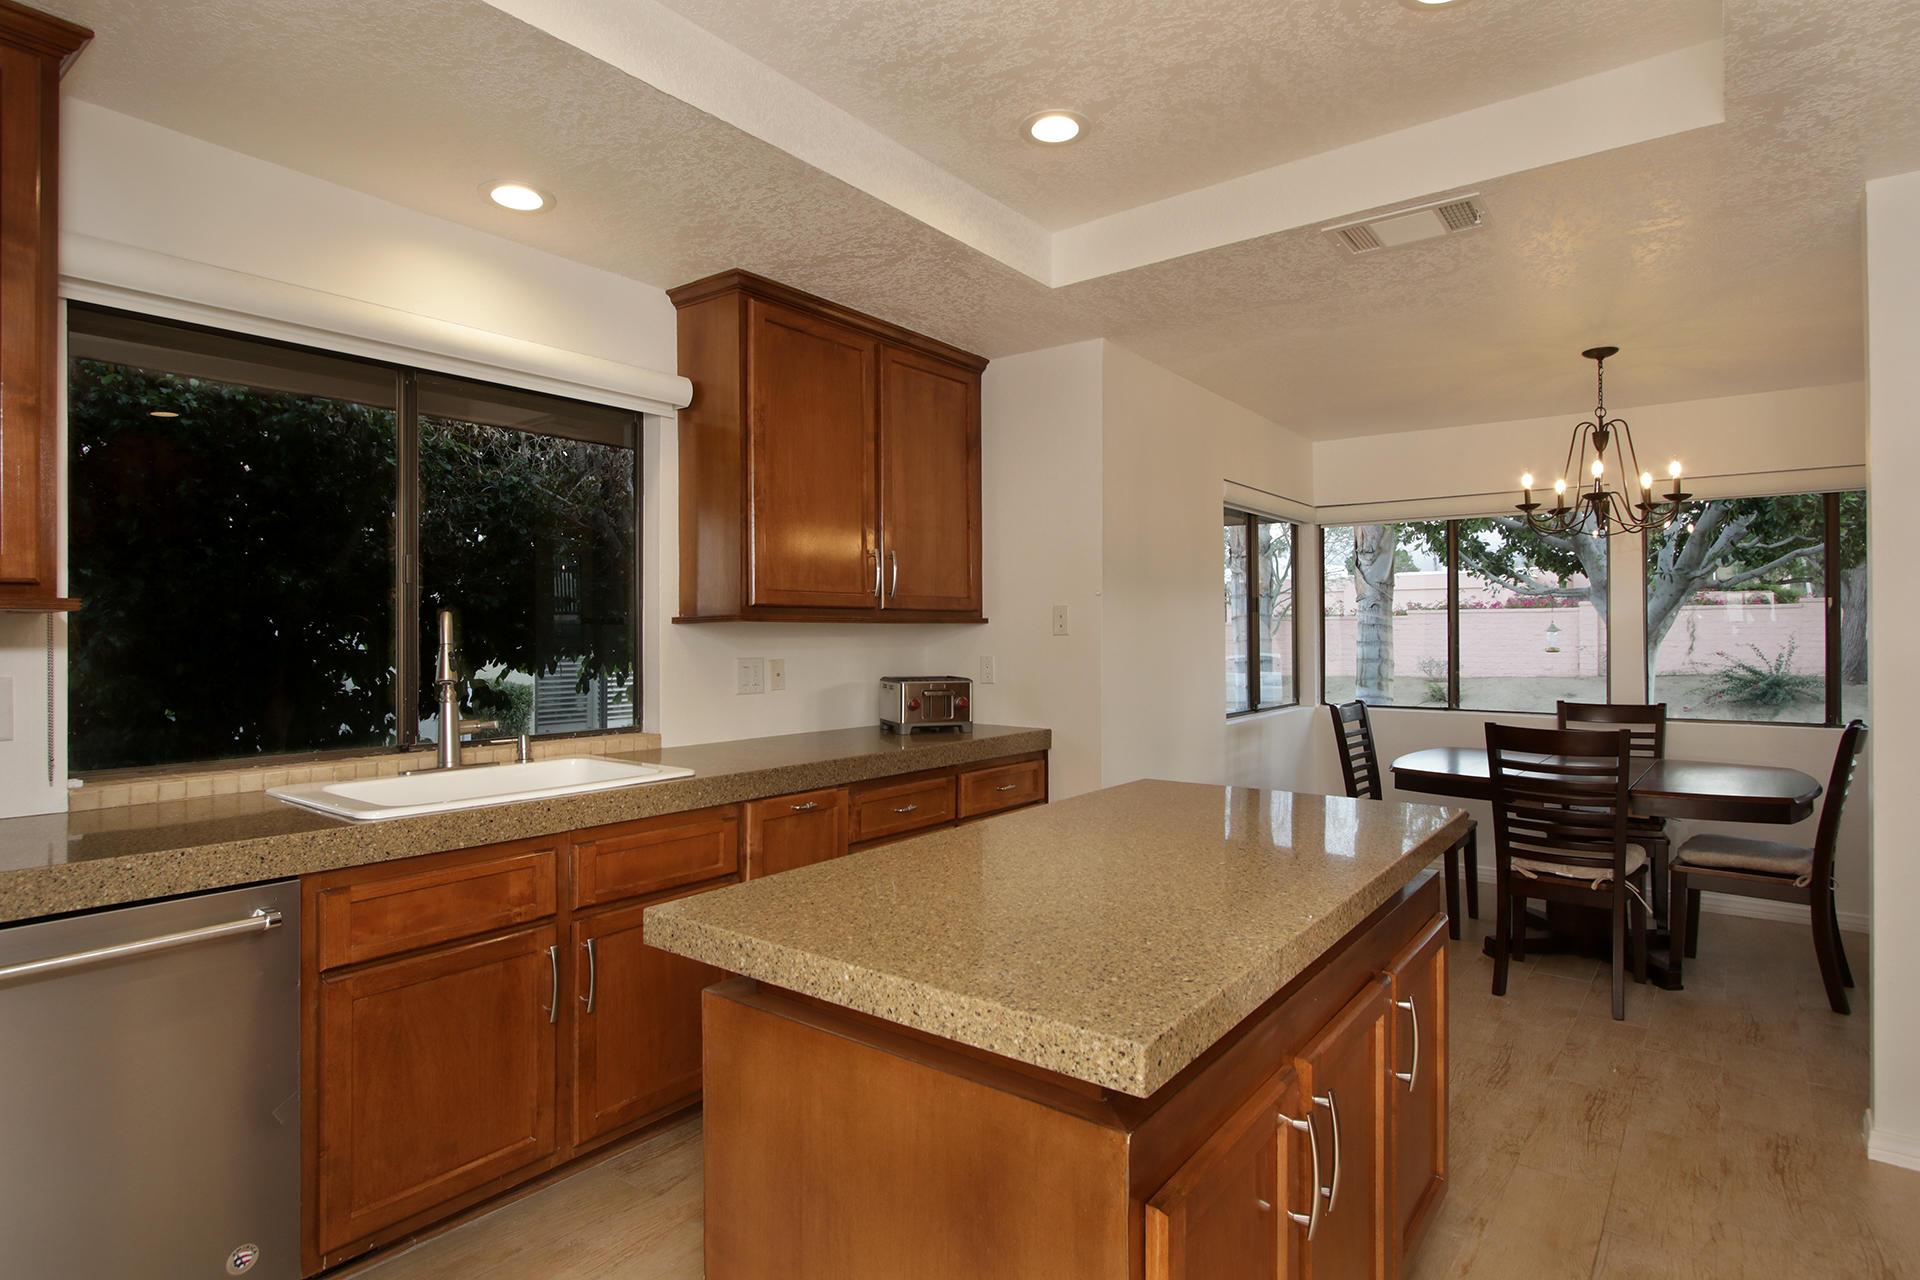 73530 Grapevine Street, Palm Desert, California 92260, 3 Bedrooms Bedrooms, ,3 BathroomsBathrooms,Residential,For Sale,73530 Grapevine Street,219045460